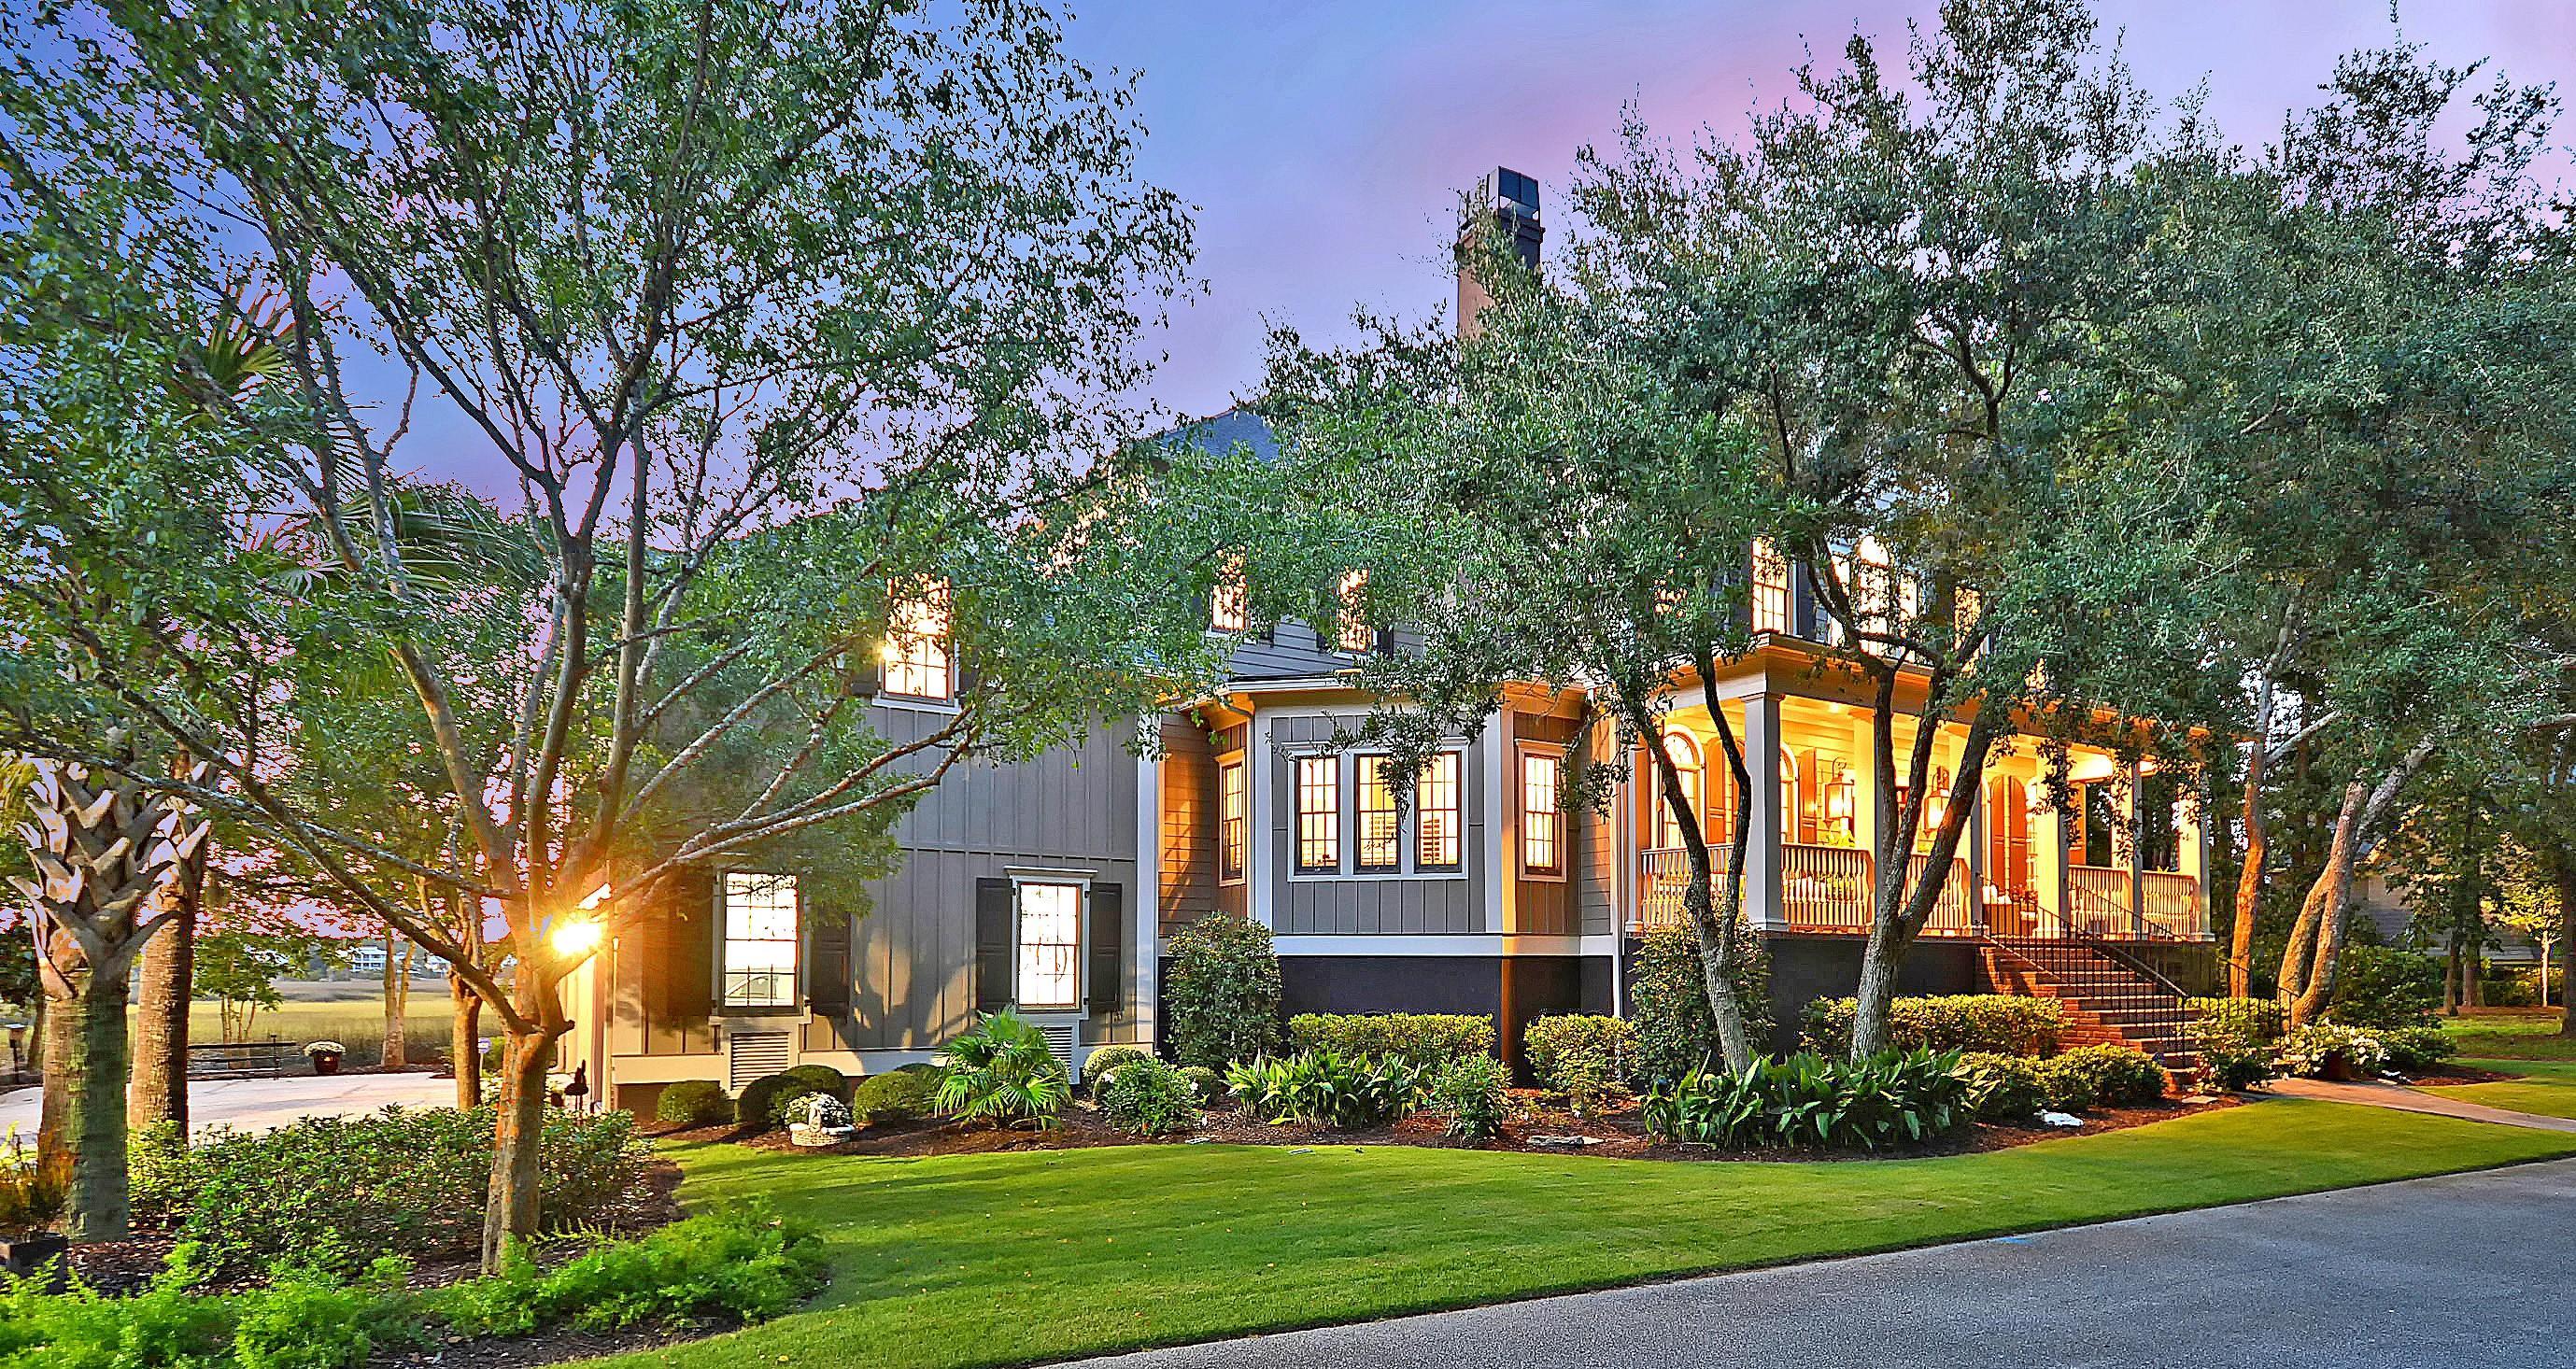 Daniel Island Homes For Sale - 41 Watroo, Charleston, SC - 49